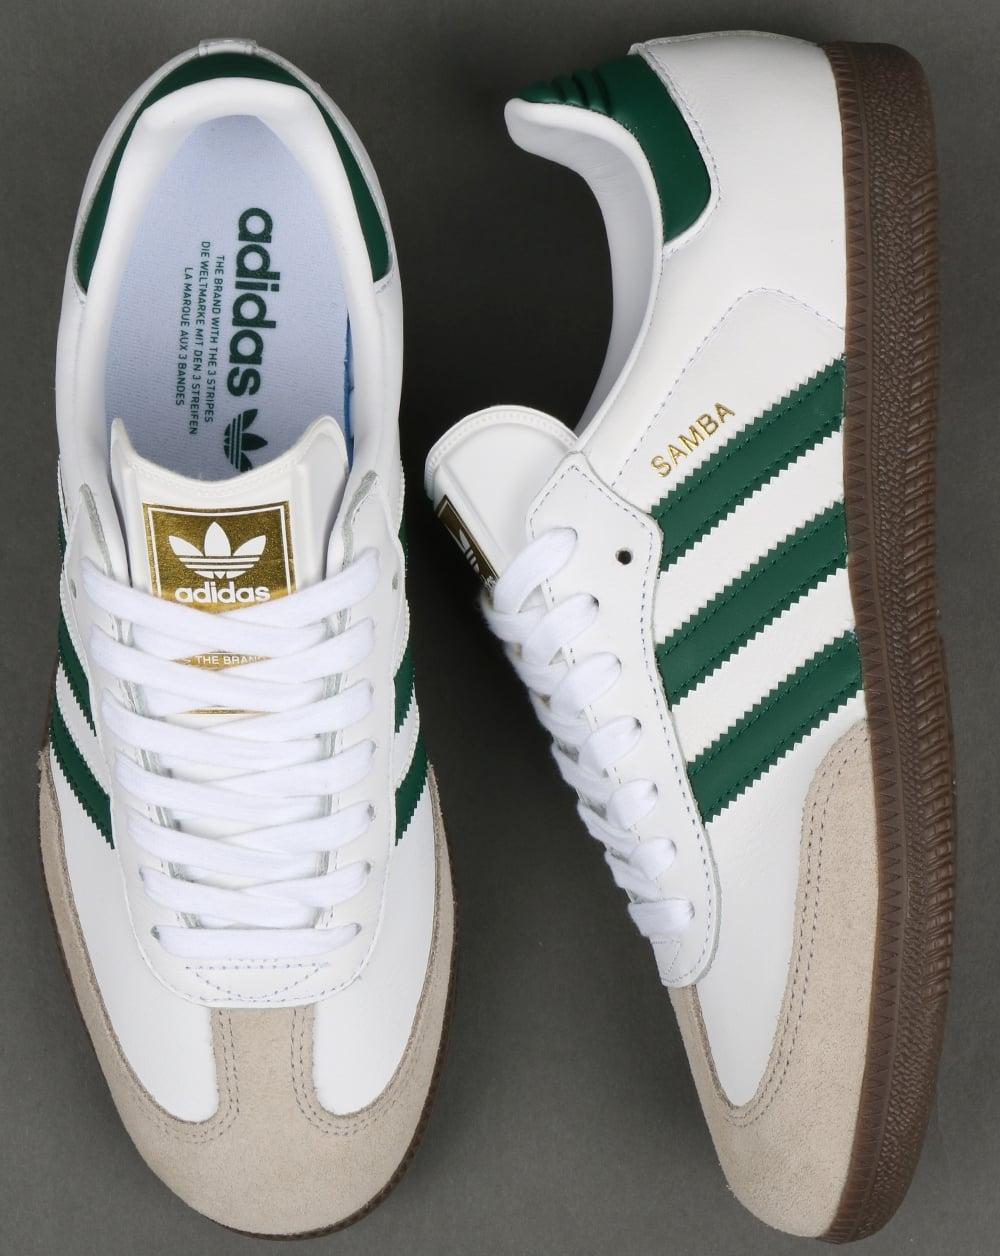 Adidas Samba Og Trainers White Green Leather Shoes Super